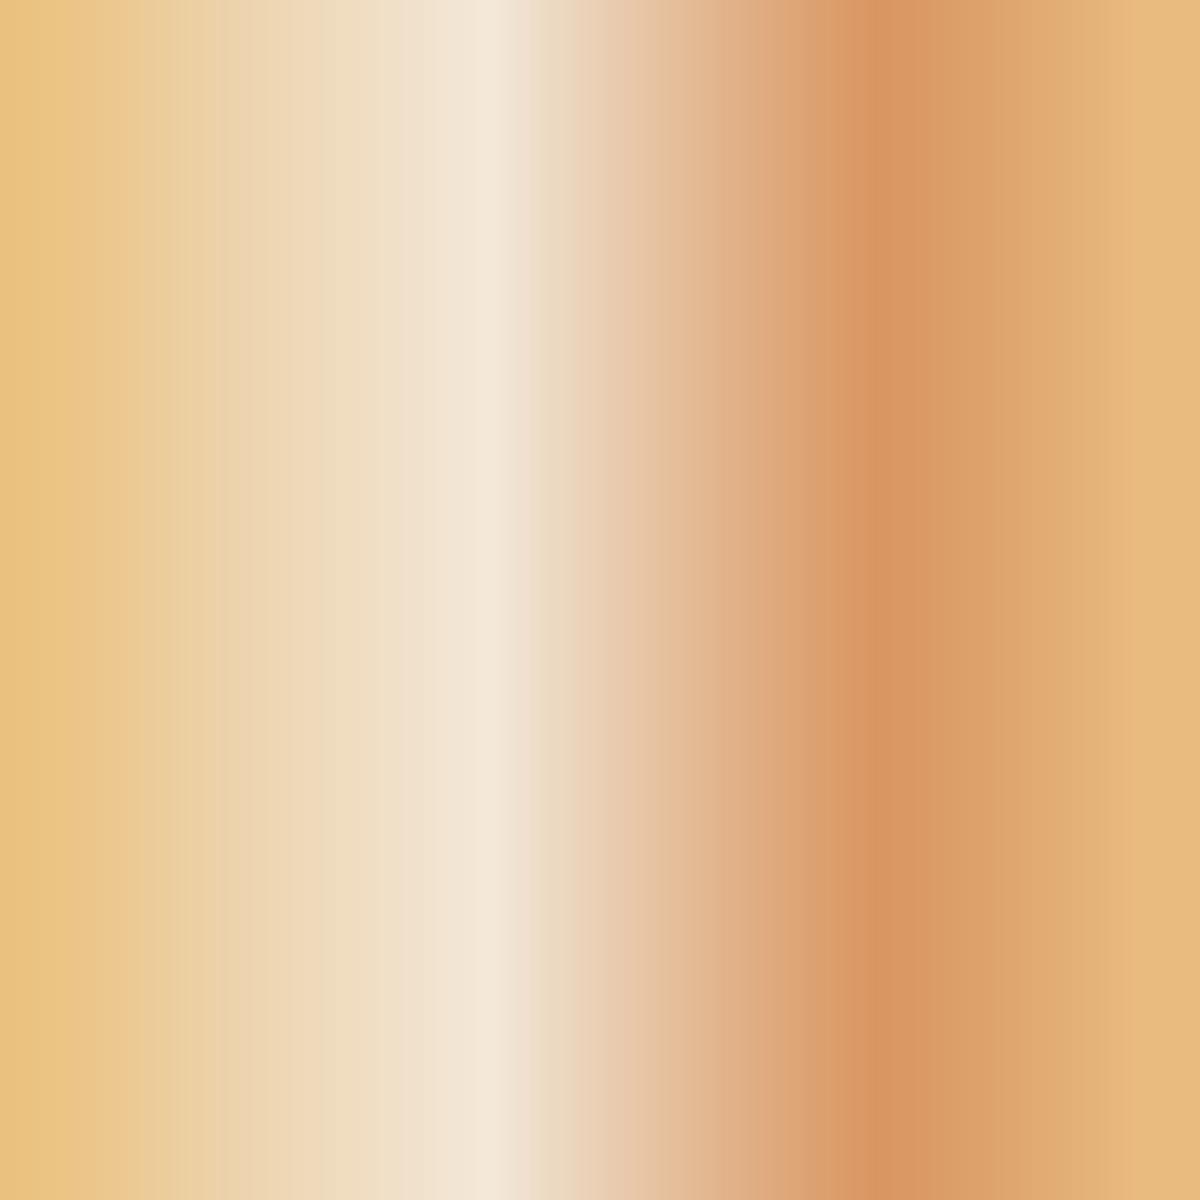 FolkArt ® Brushed Metal™ Acrylic Paint - Pearl Gold, 2 oz.